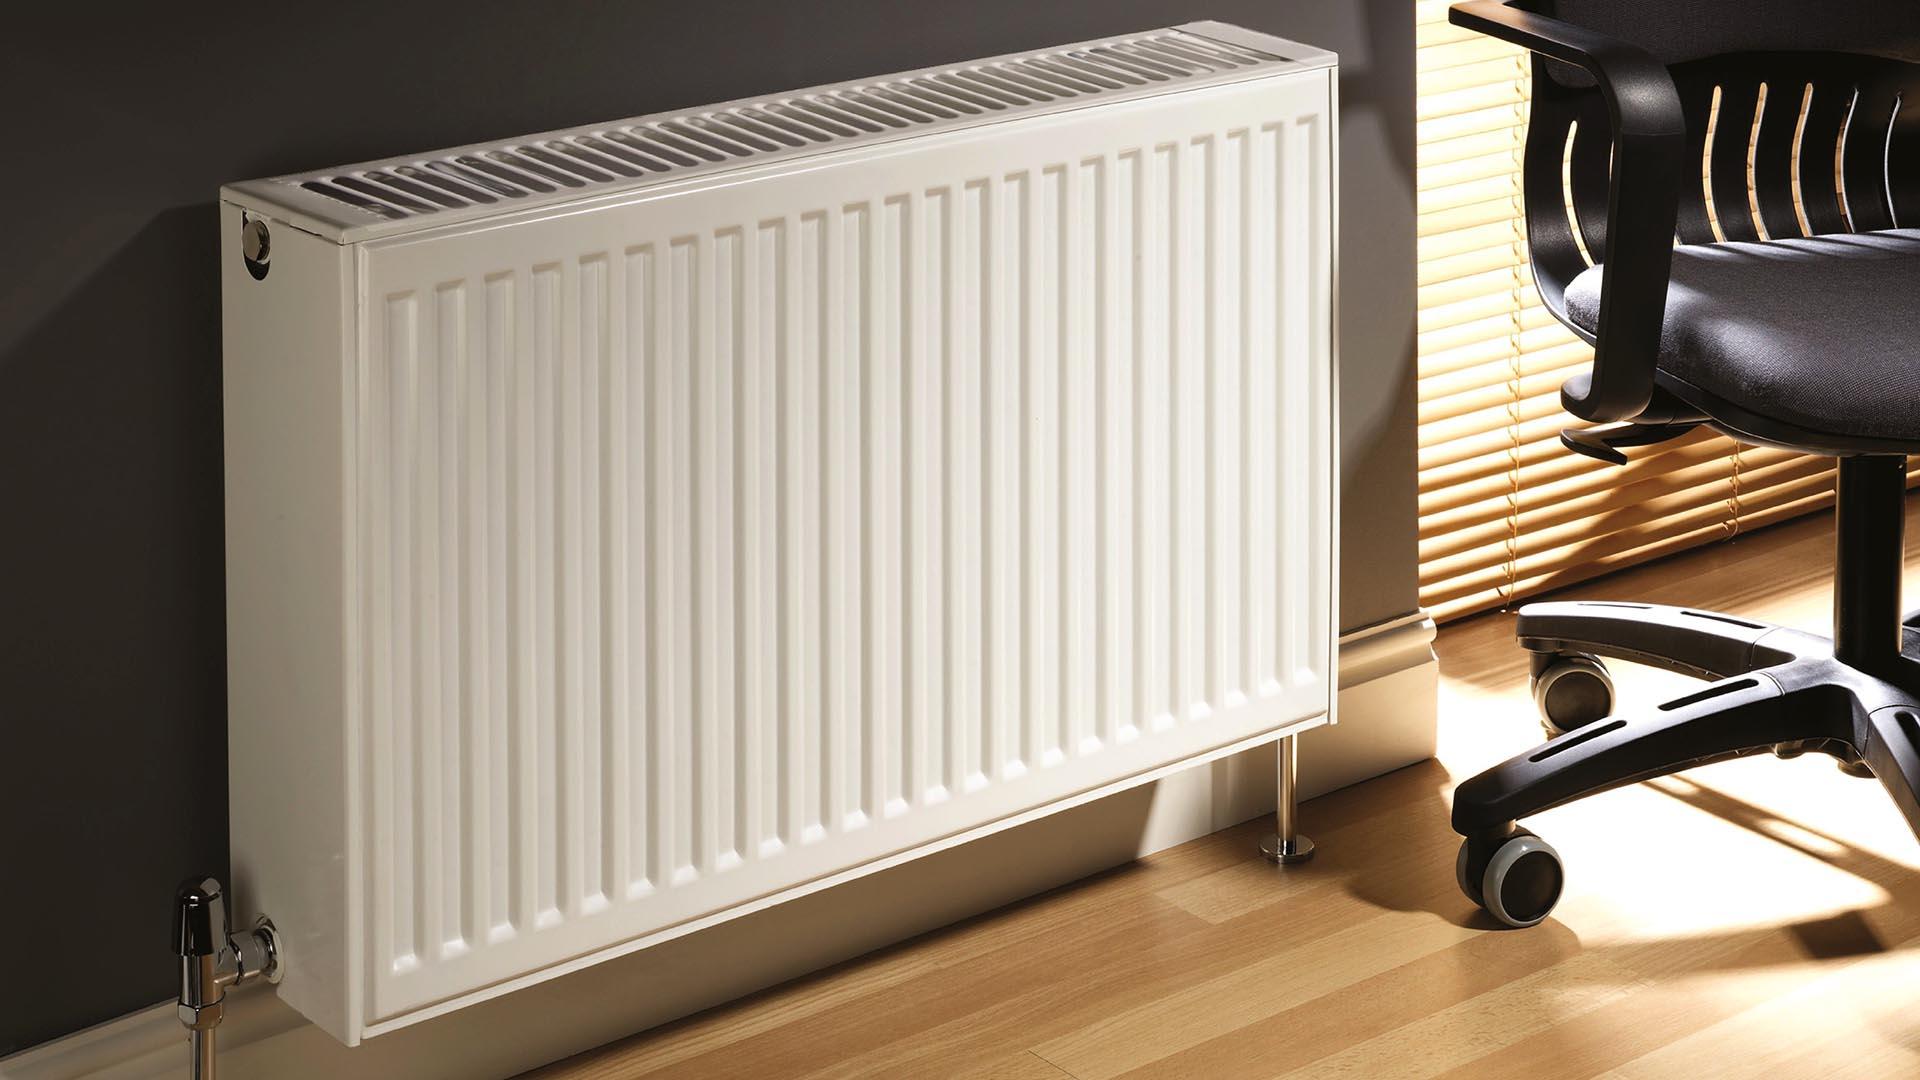 heating_1920x1080_2